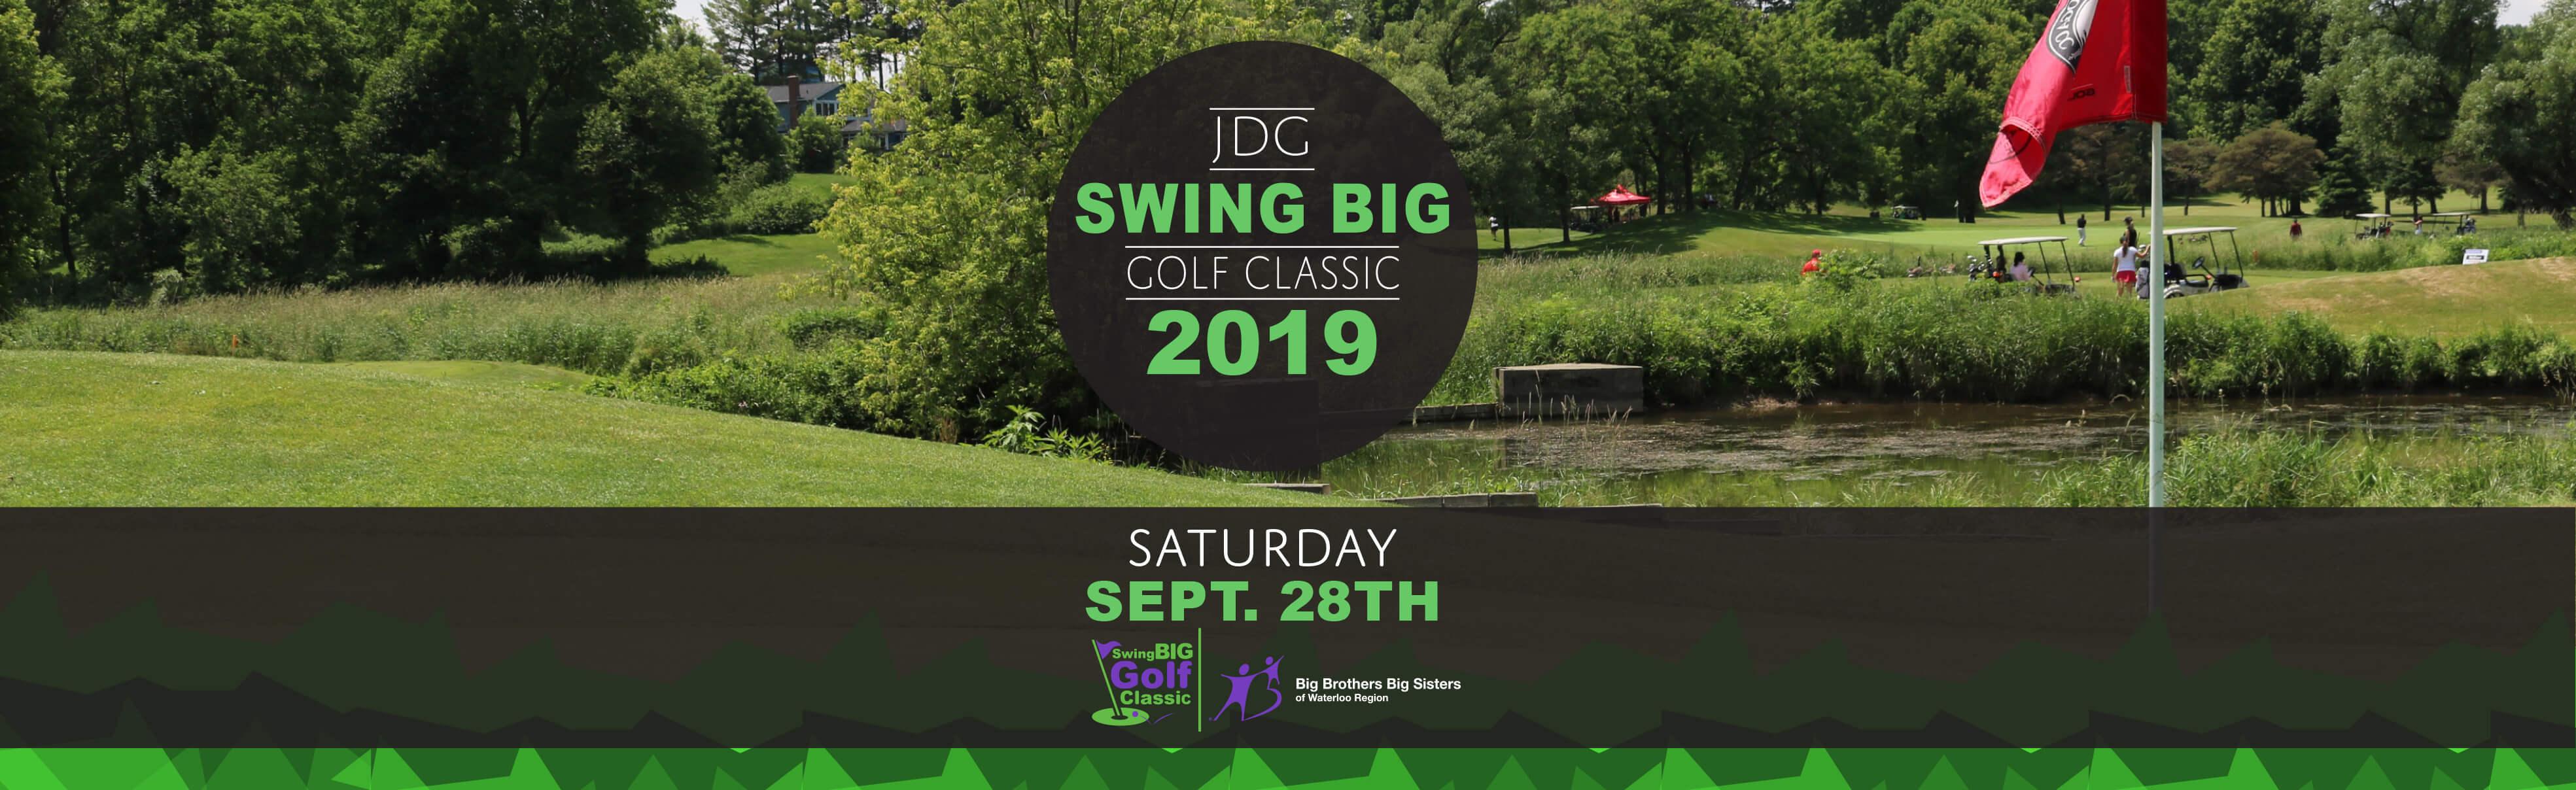 Swing Big 2019 Event Webpage Header